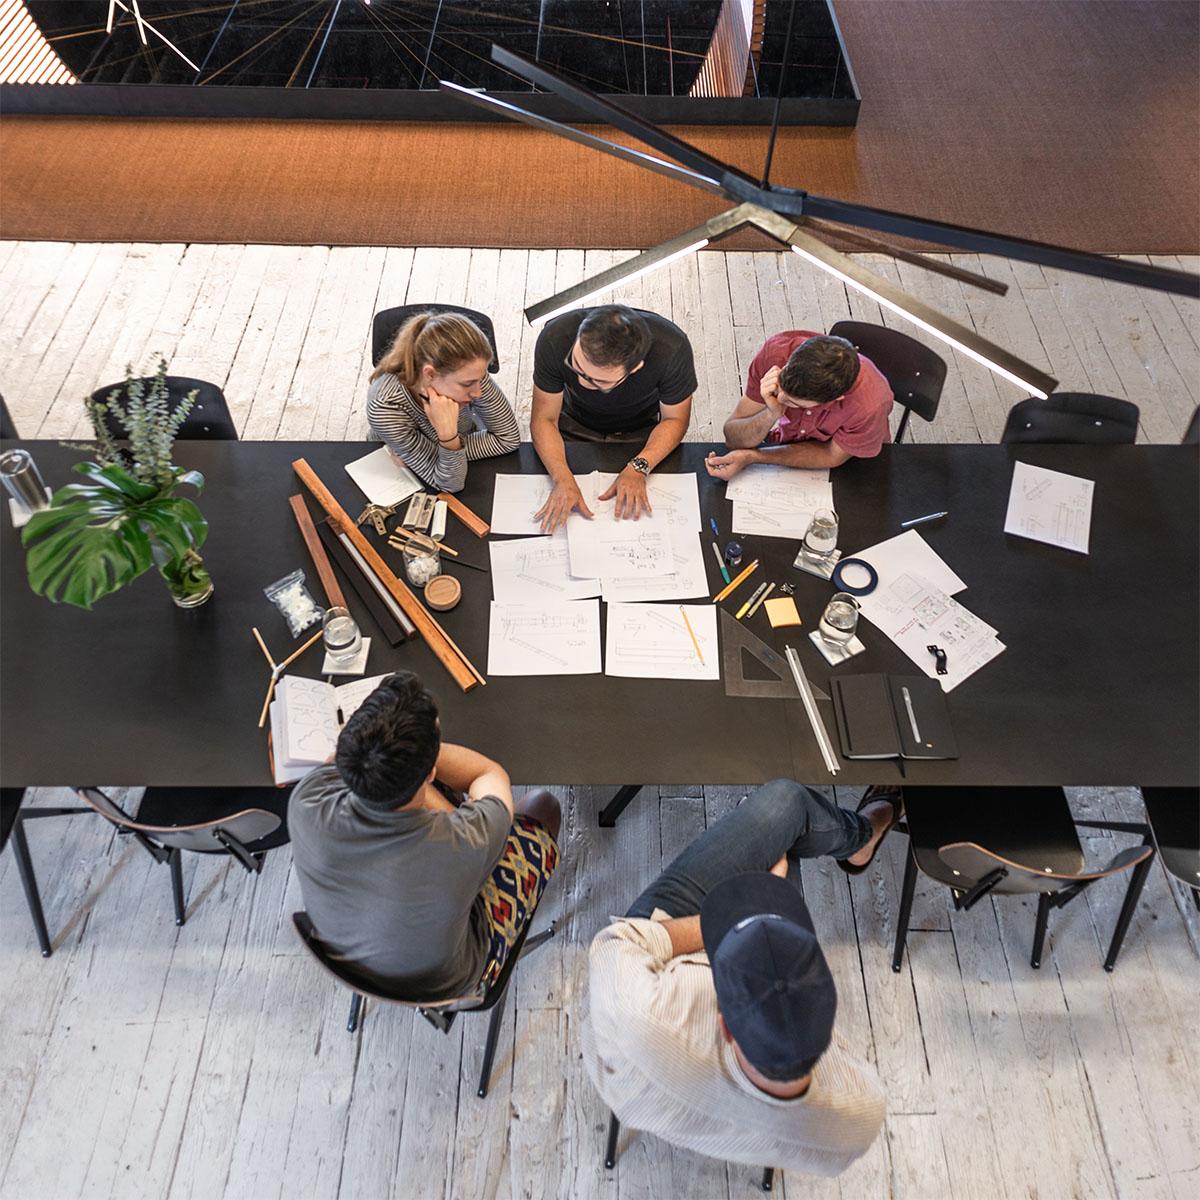 Stickbulb's design team in their New York City studio.